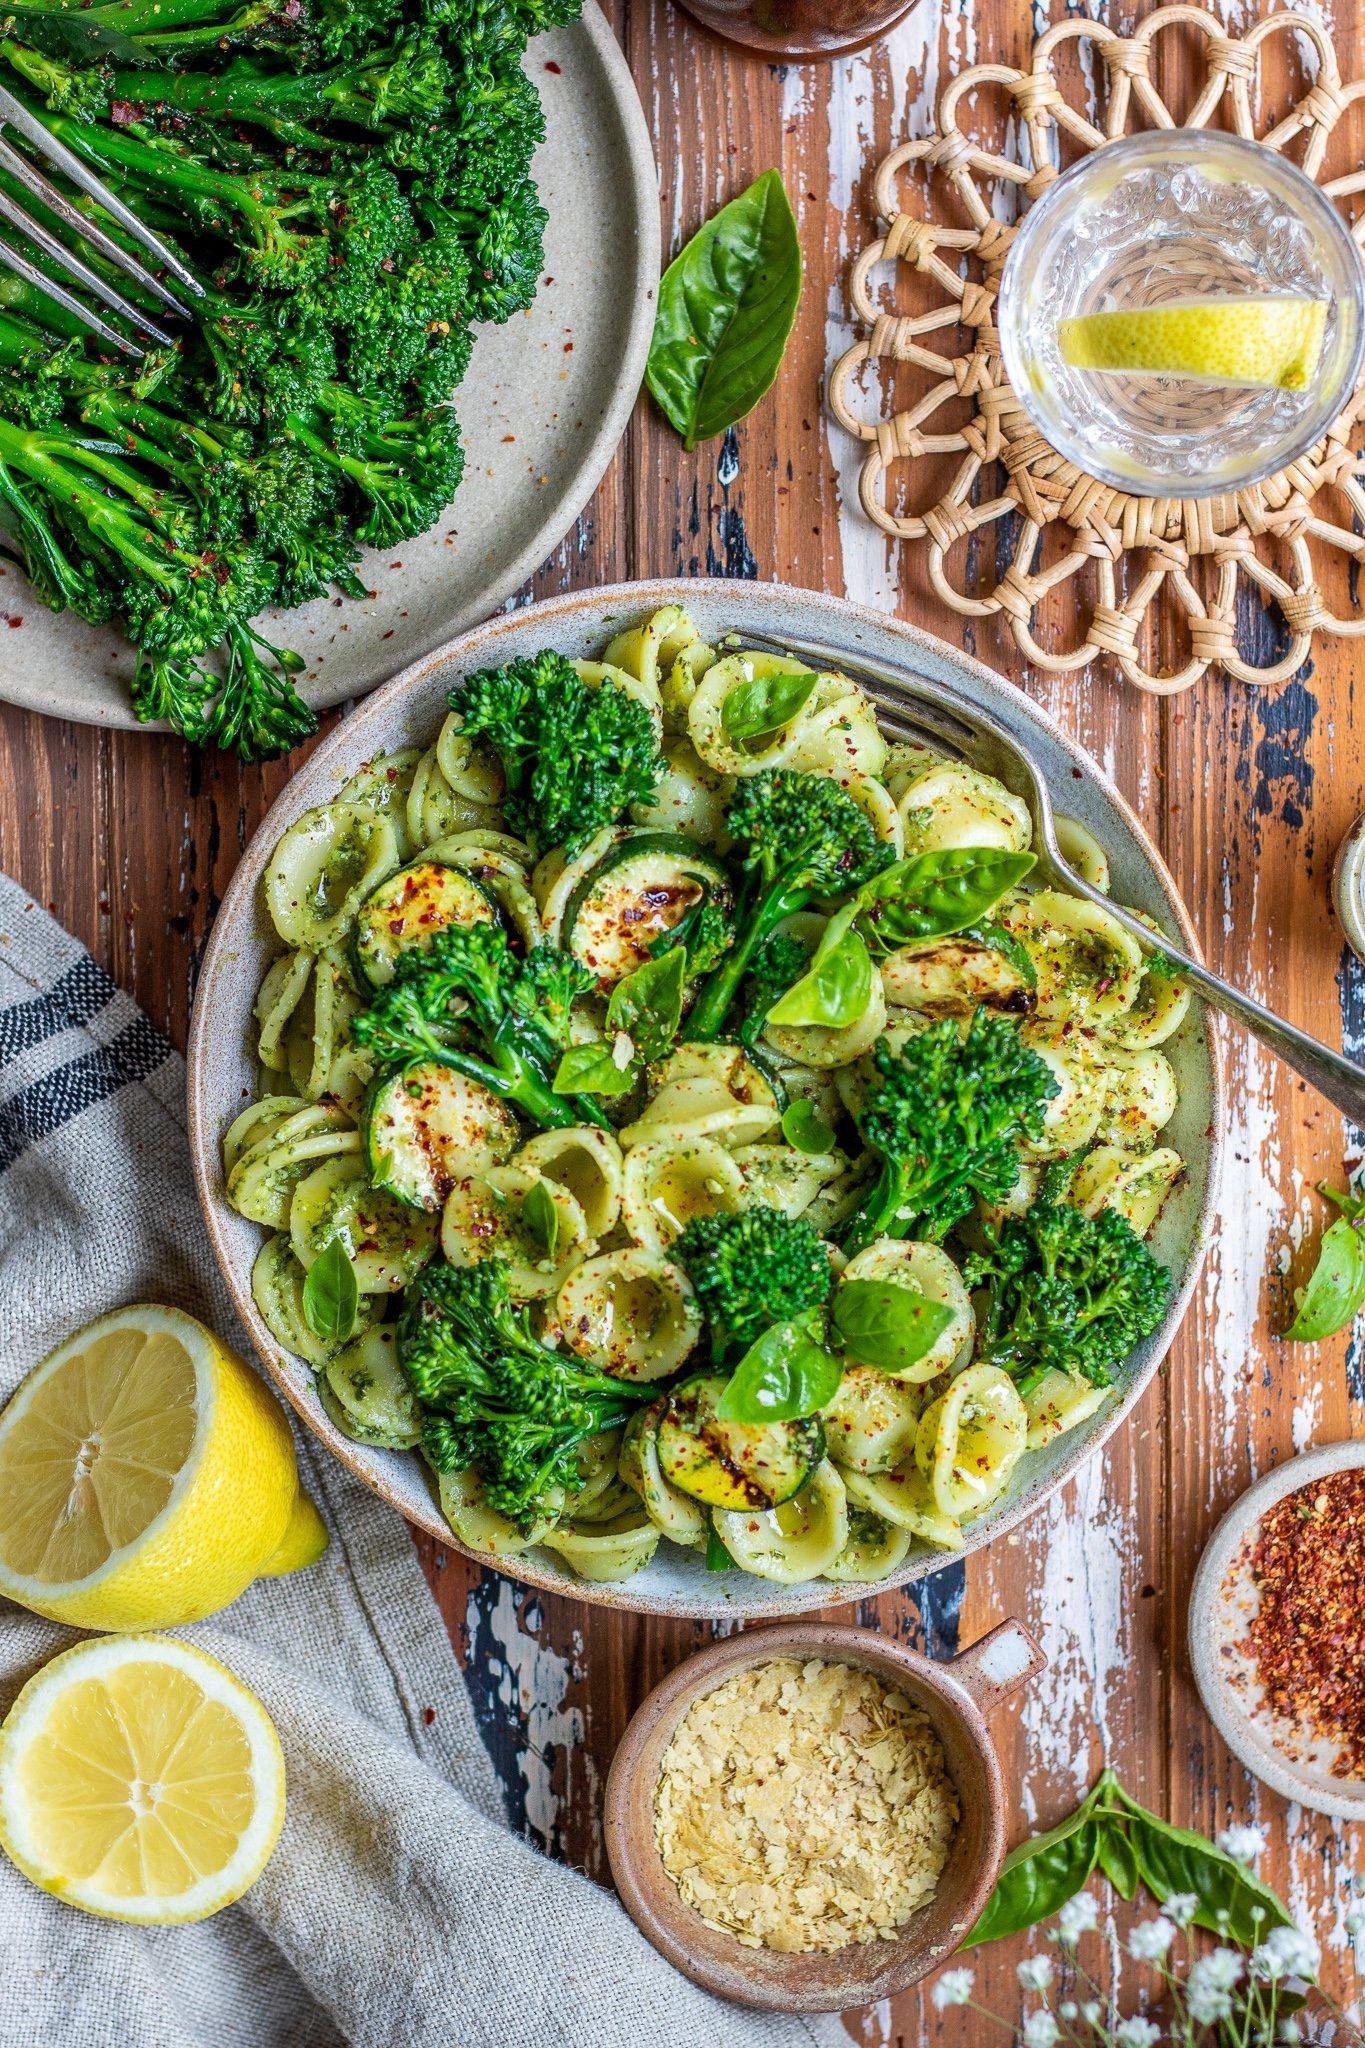 Pumpkin Seed Pesto Orecchiette with Tenderstem® Broccoli & Grilled Courgette